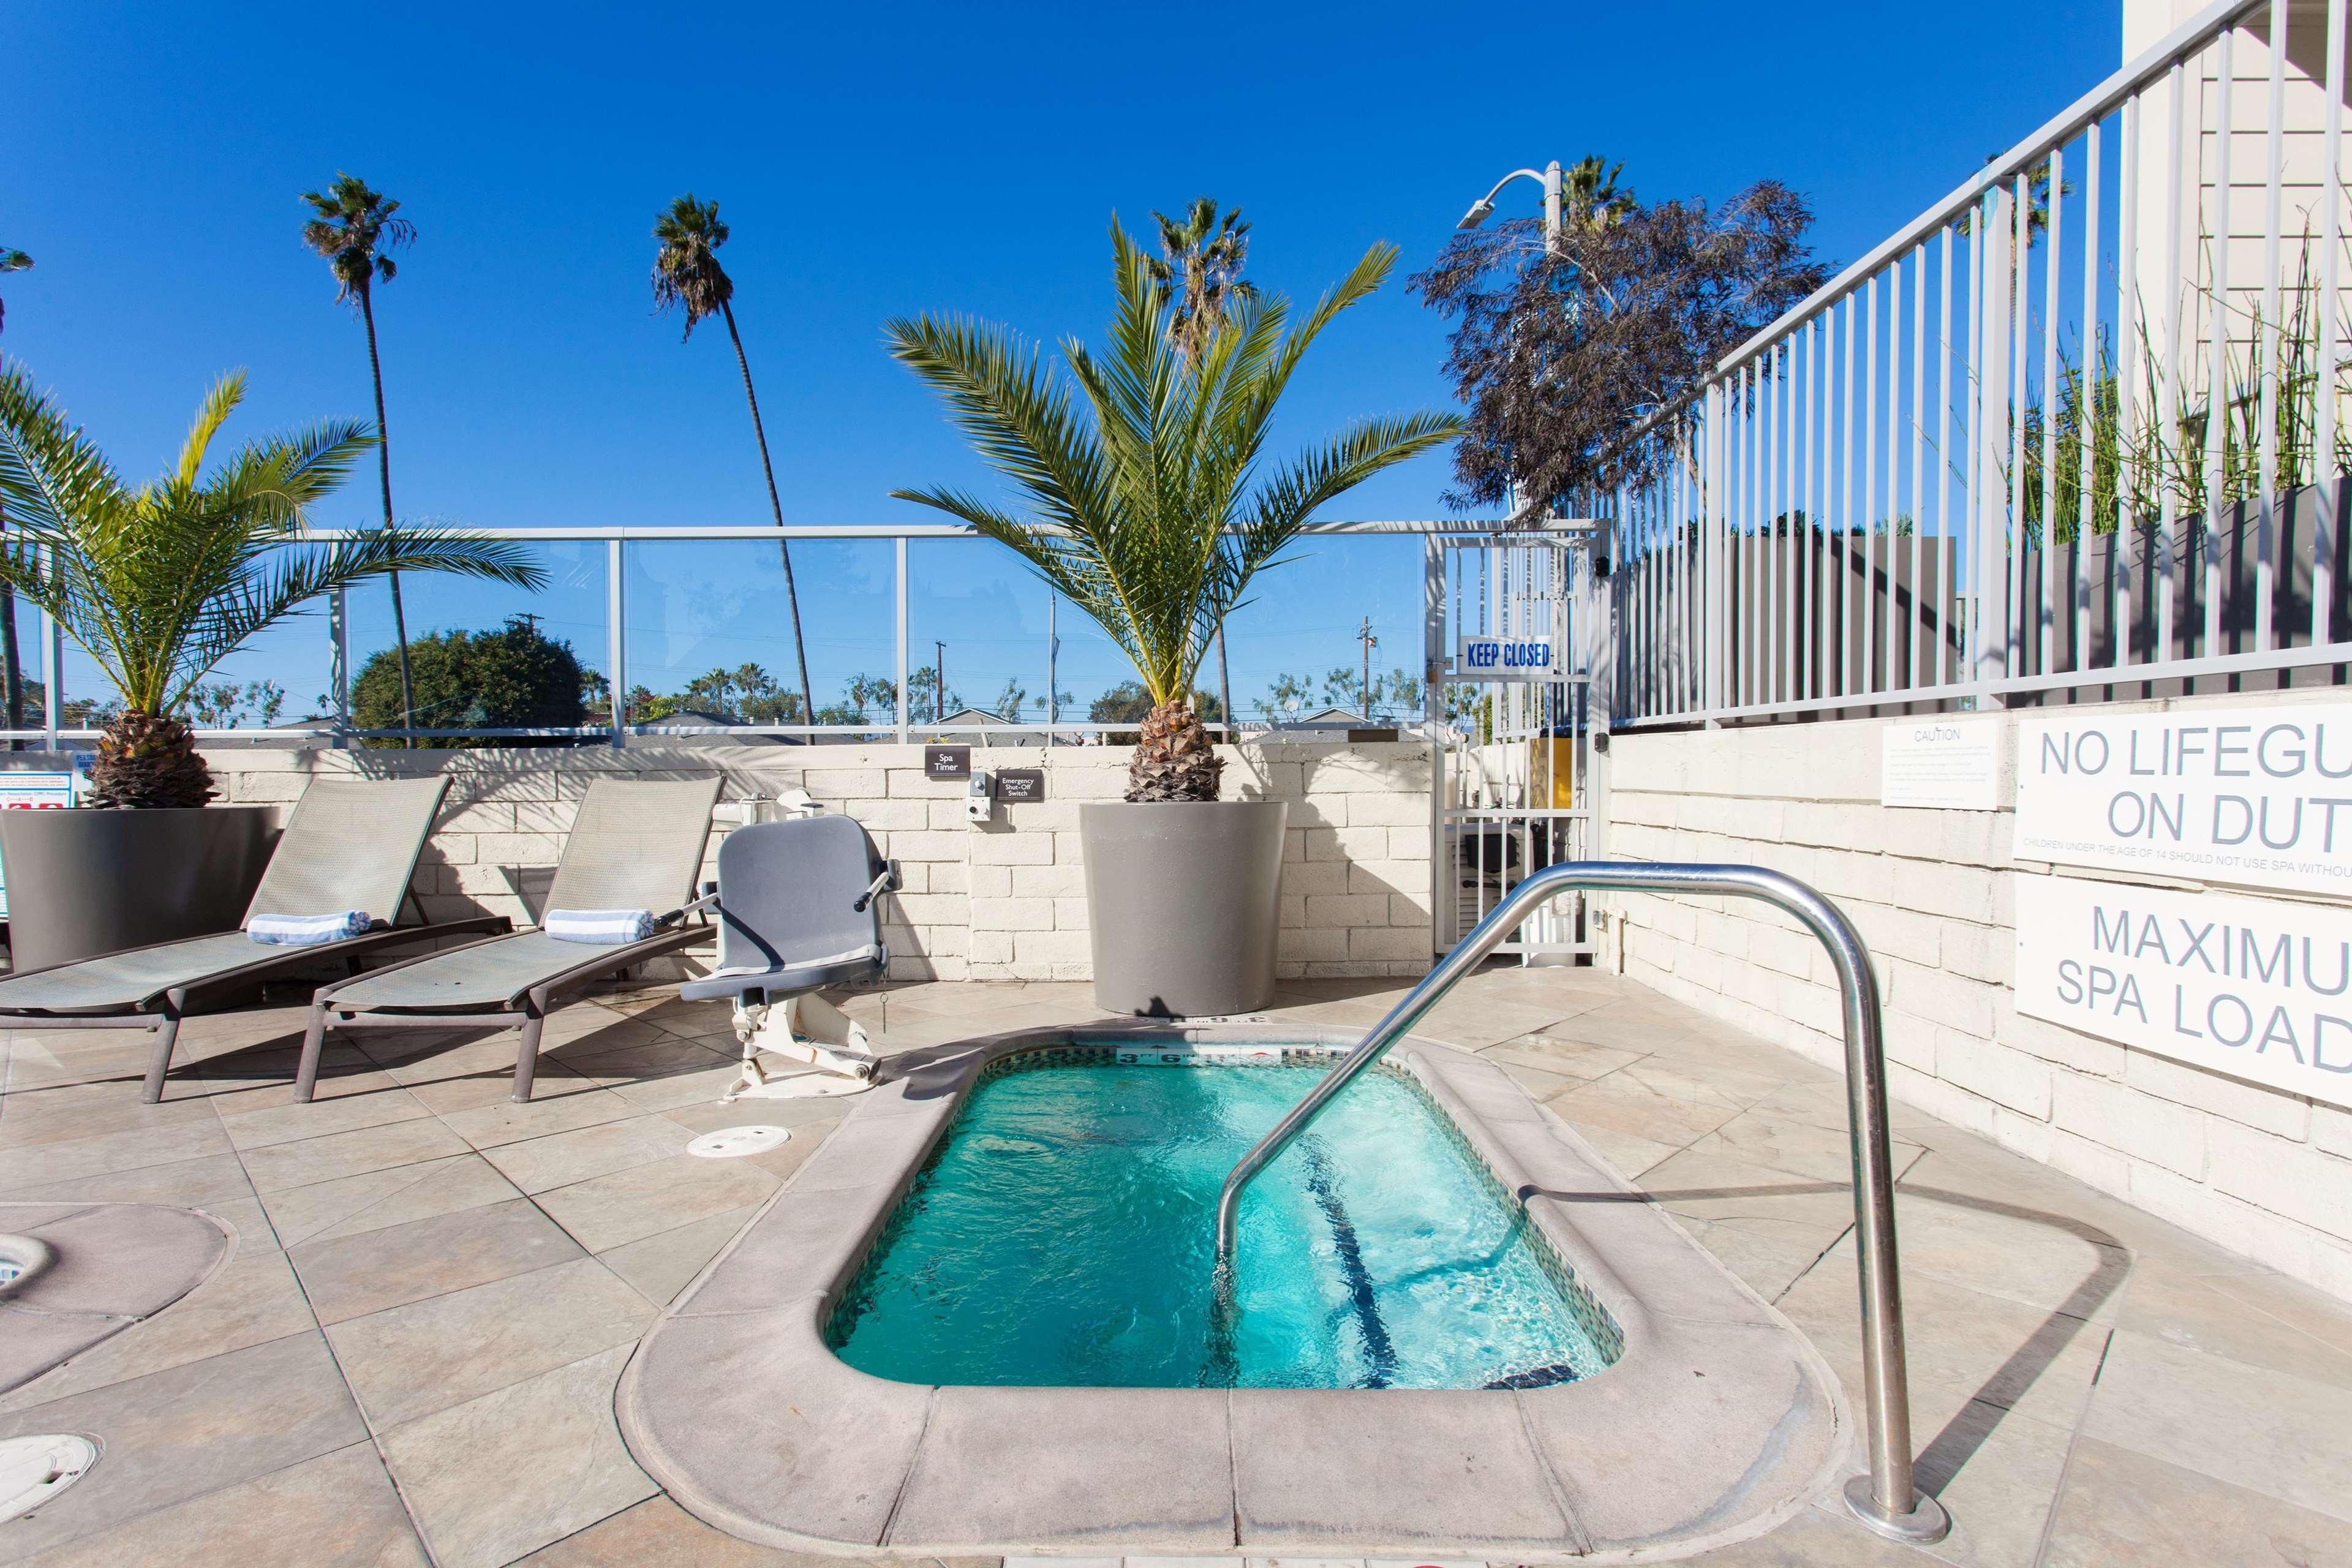 reviews of hilton garden inn los angeles marina del rey - Hilton Garden Inn Marina Del Rey